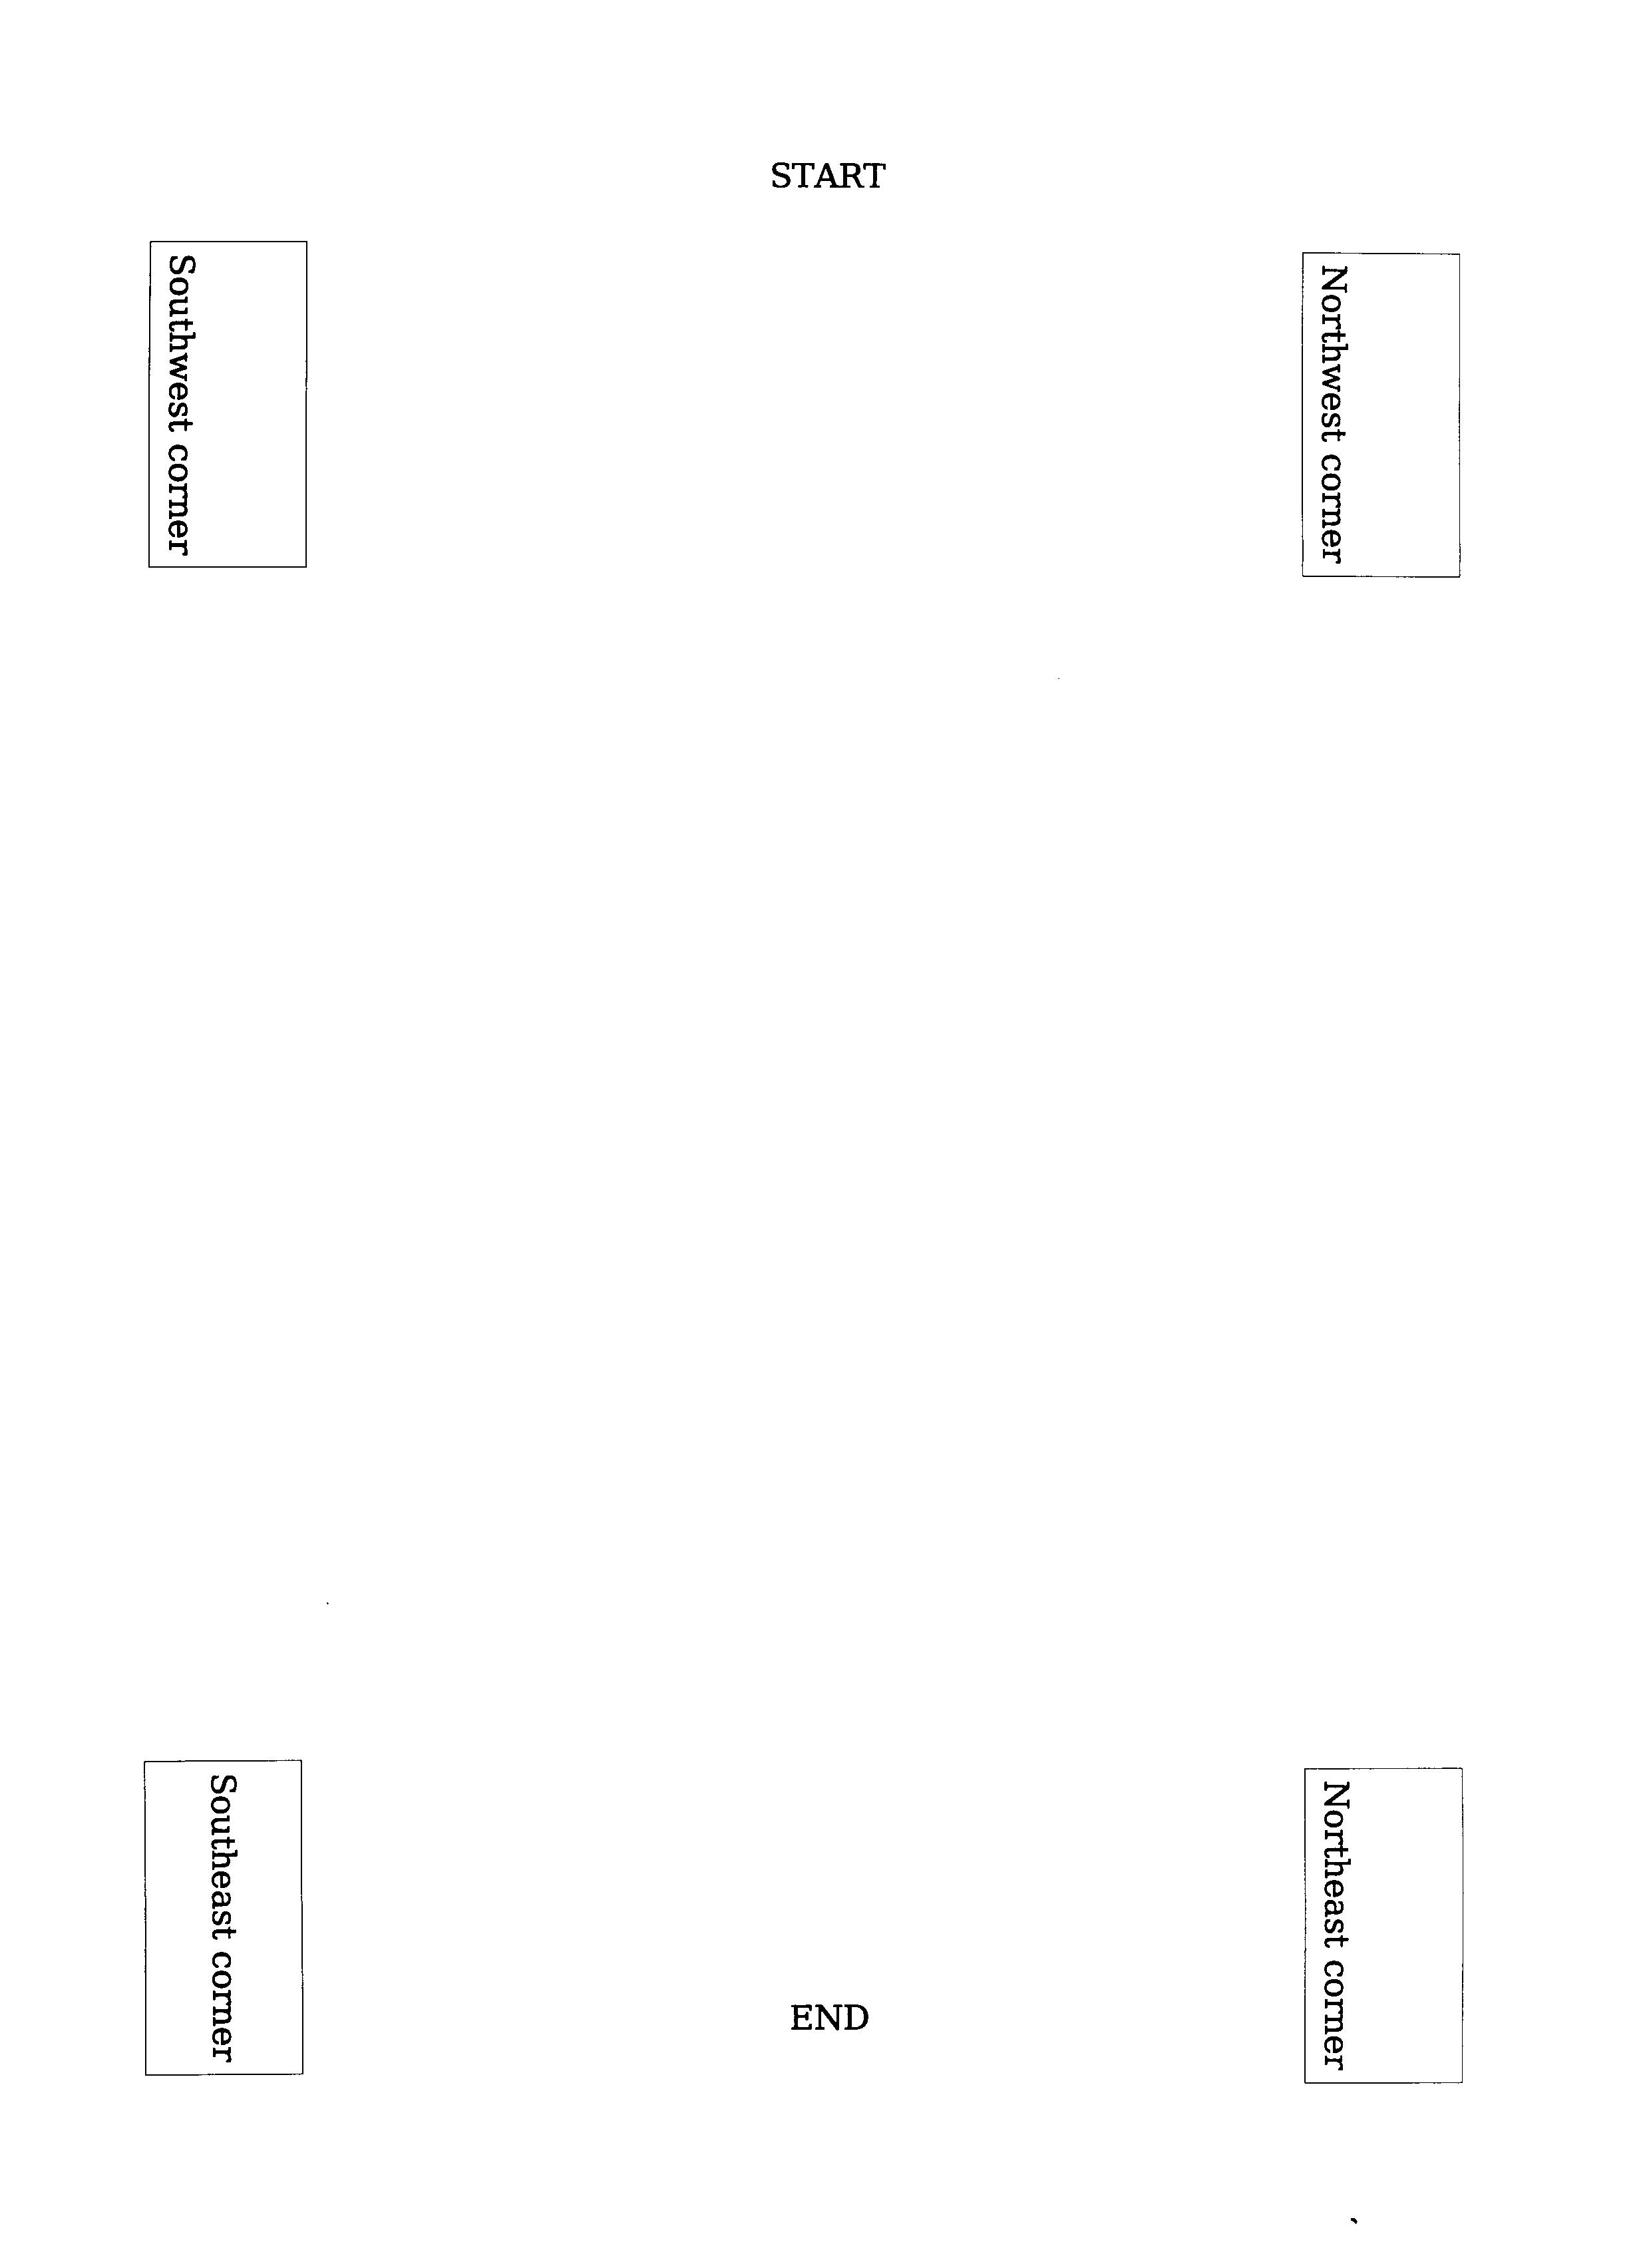 Printing Envelopes Diagnostics For Openoffice